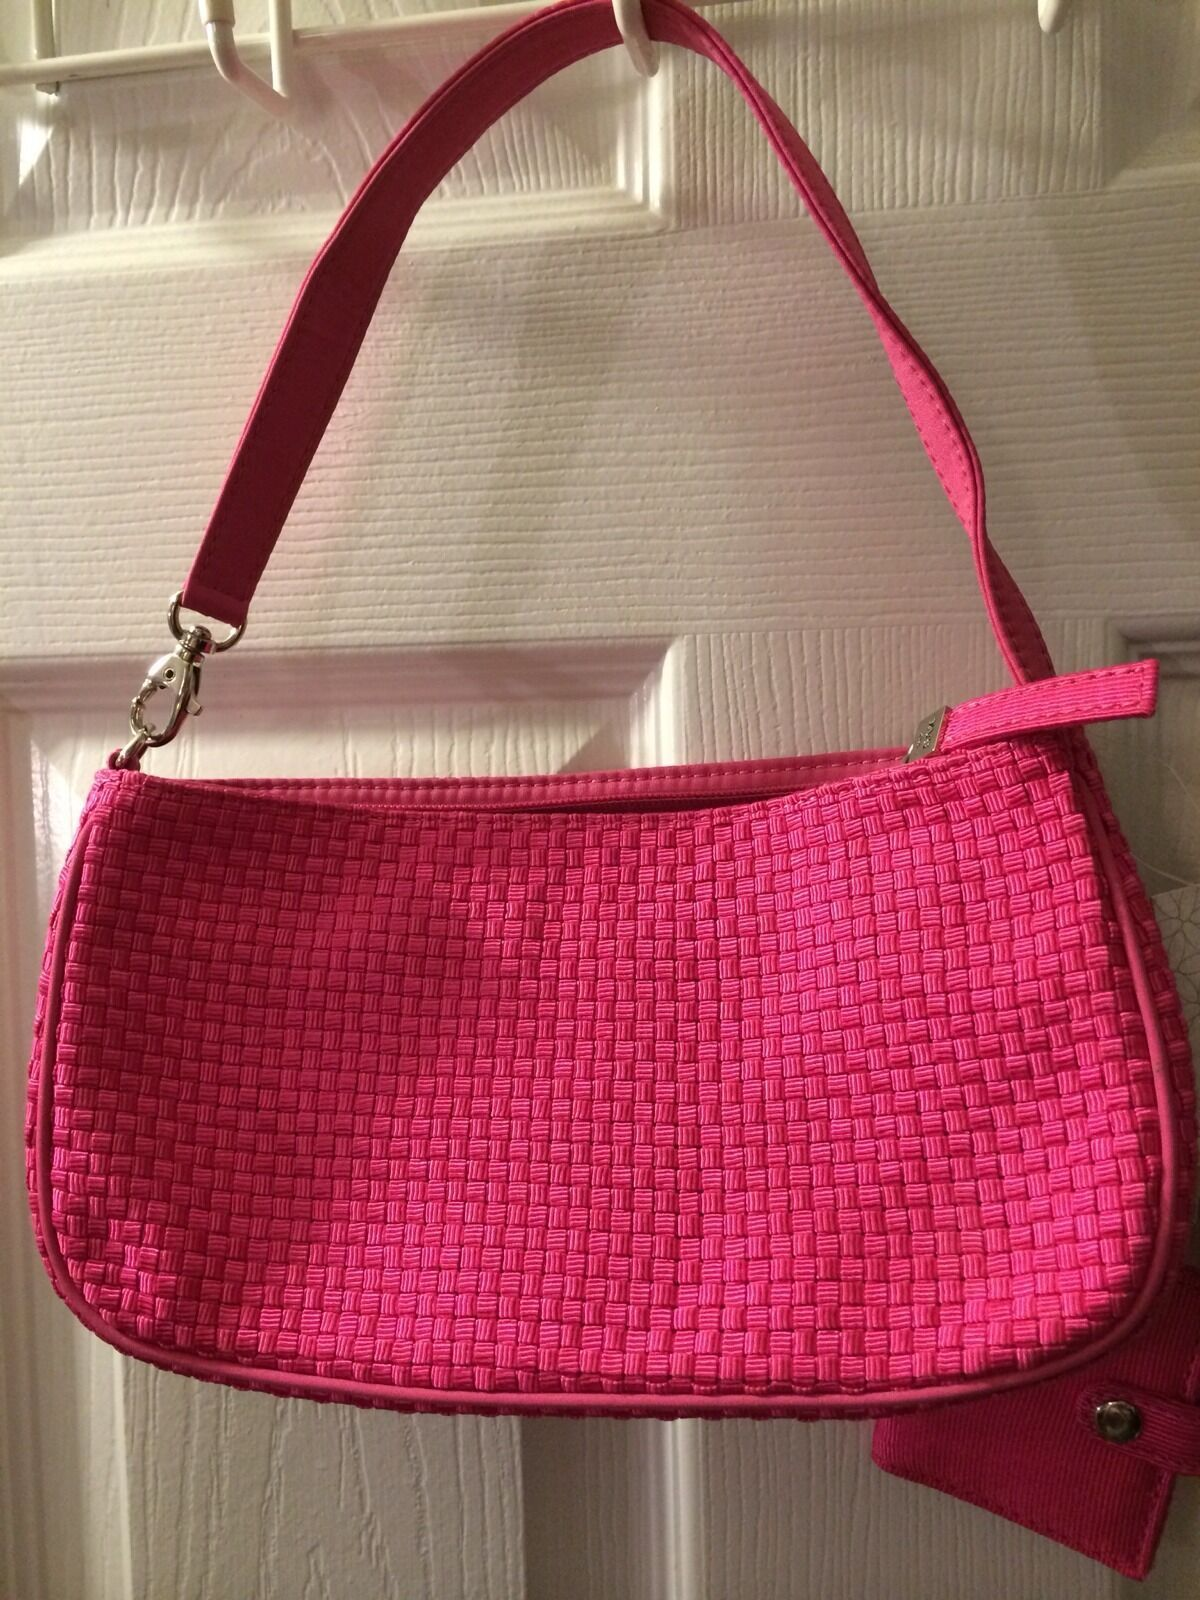 New THE SAK Purse Fuchsia Pink Woven Photo Keychain Shoulder Hobo Handbag NWT